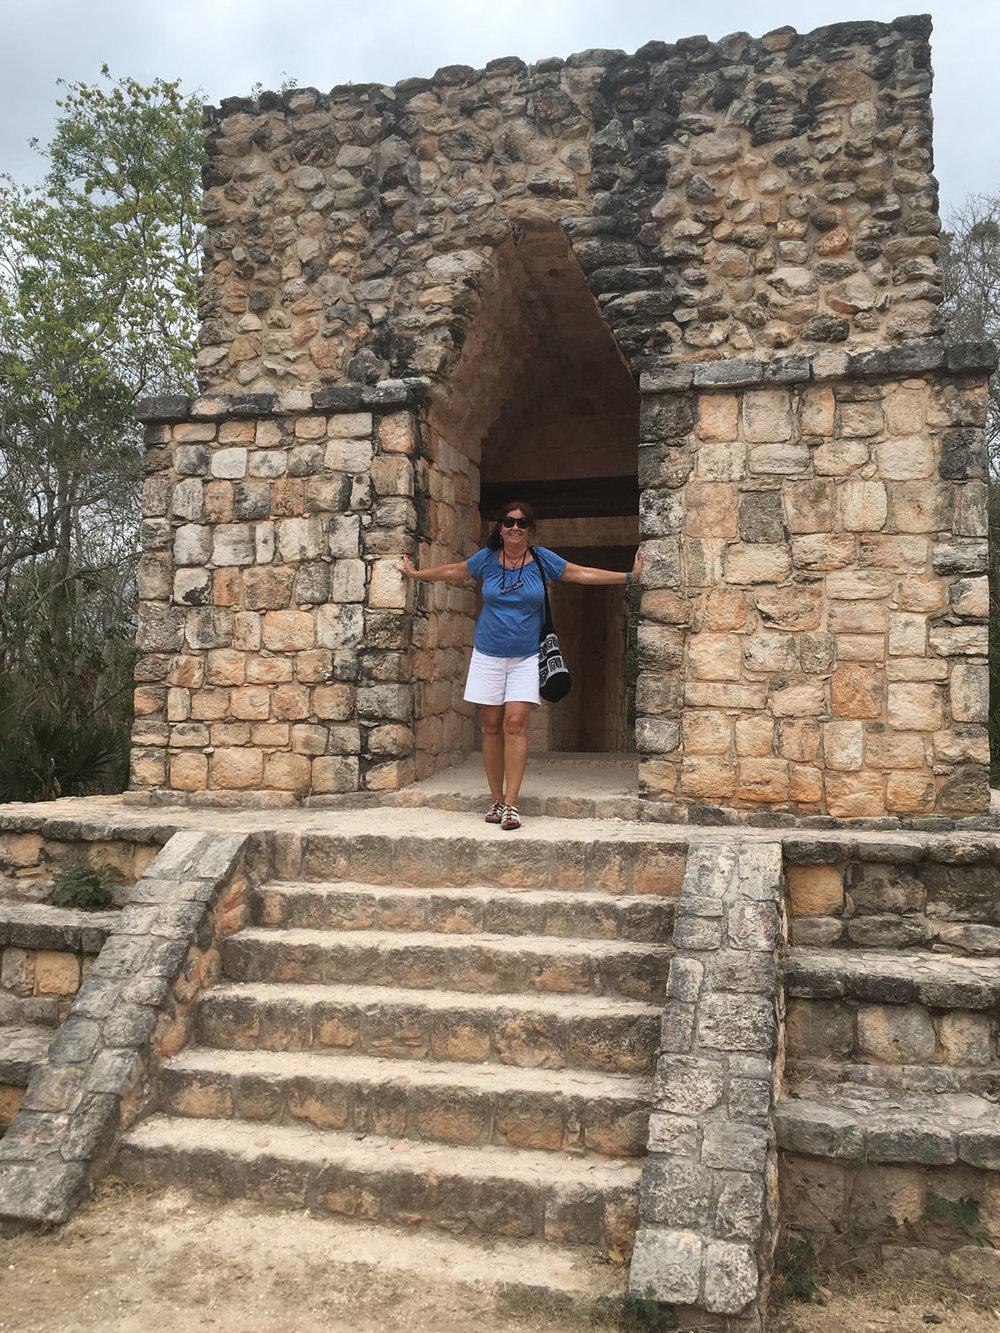 Hammocks_and_Ruins_Blog_Riviera_Maya_Mexico_Travel_Discover_Explore_Yucatan_Pyramid_Temple_Ek_Balam_21.jpg